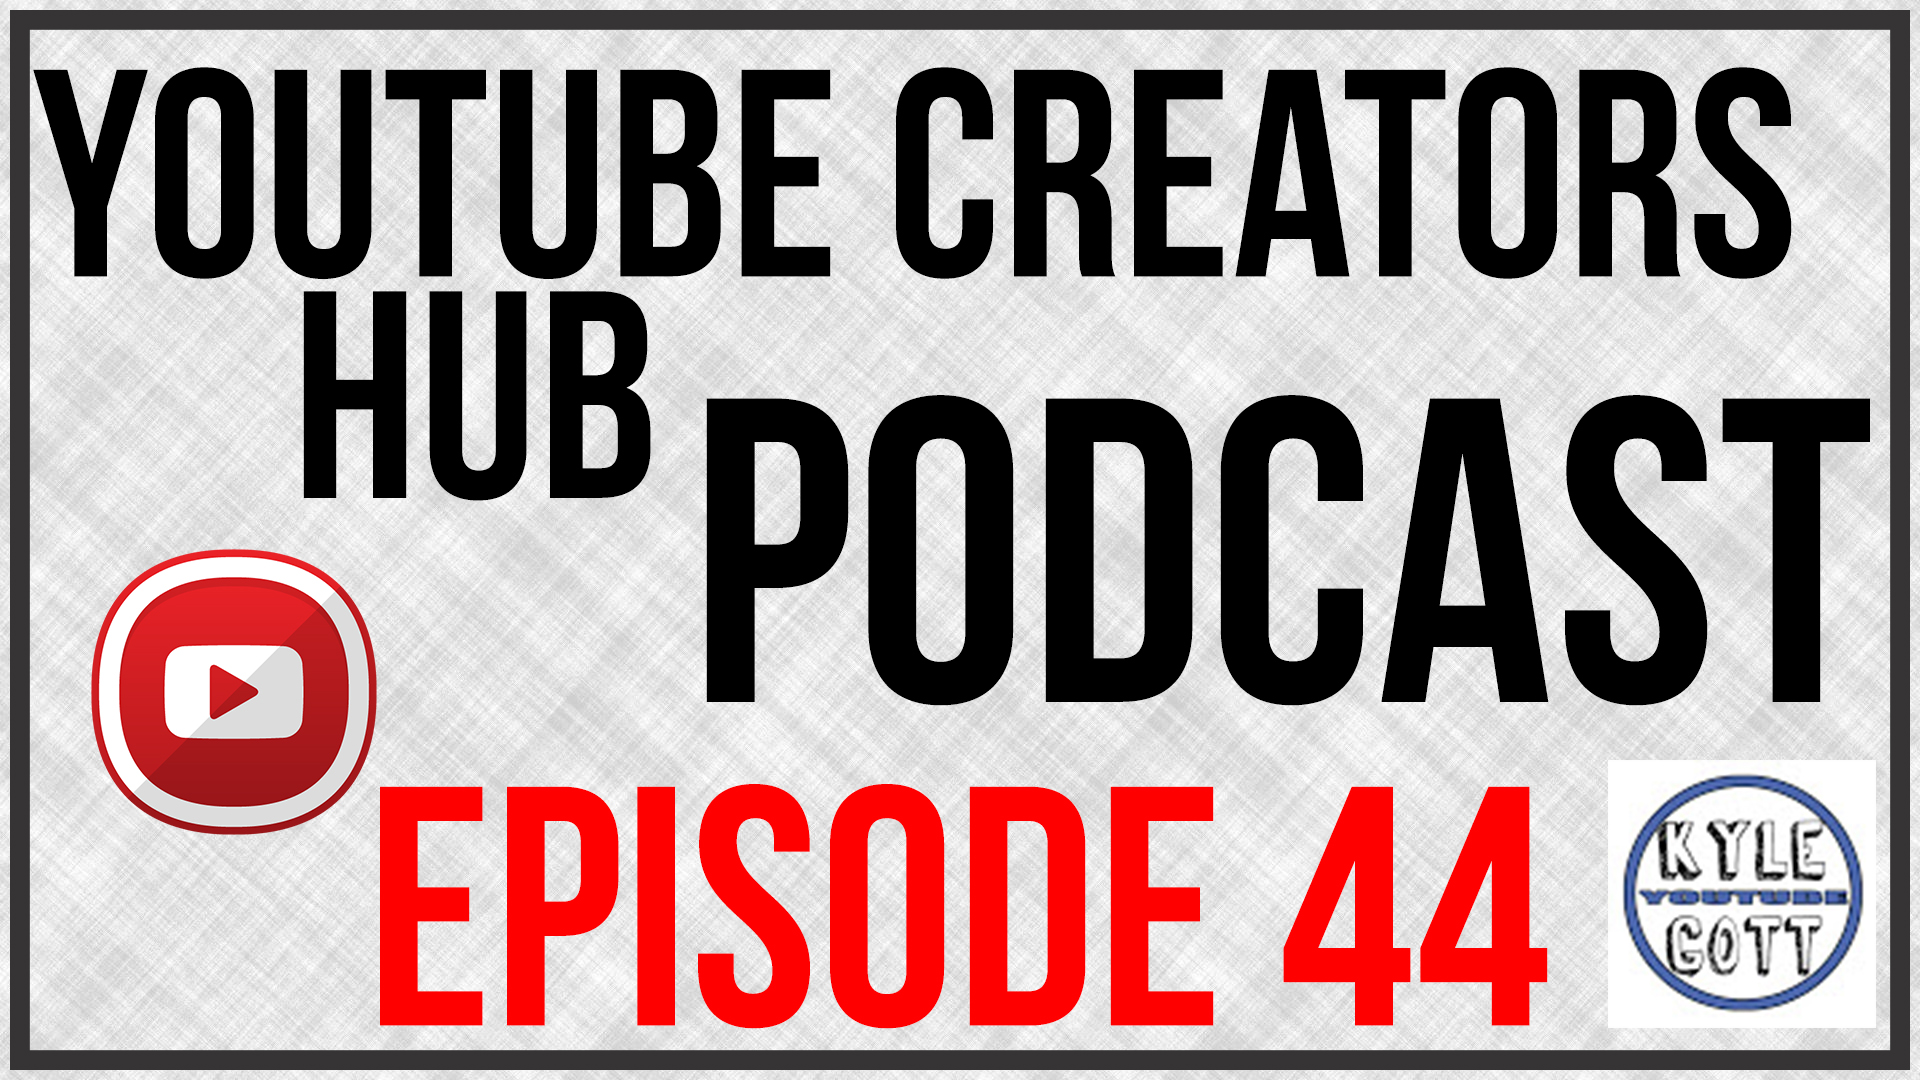 youtube creators hub podcast episode 44